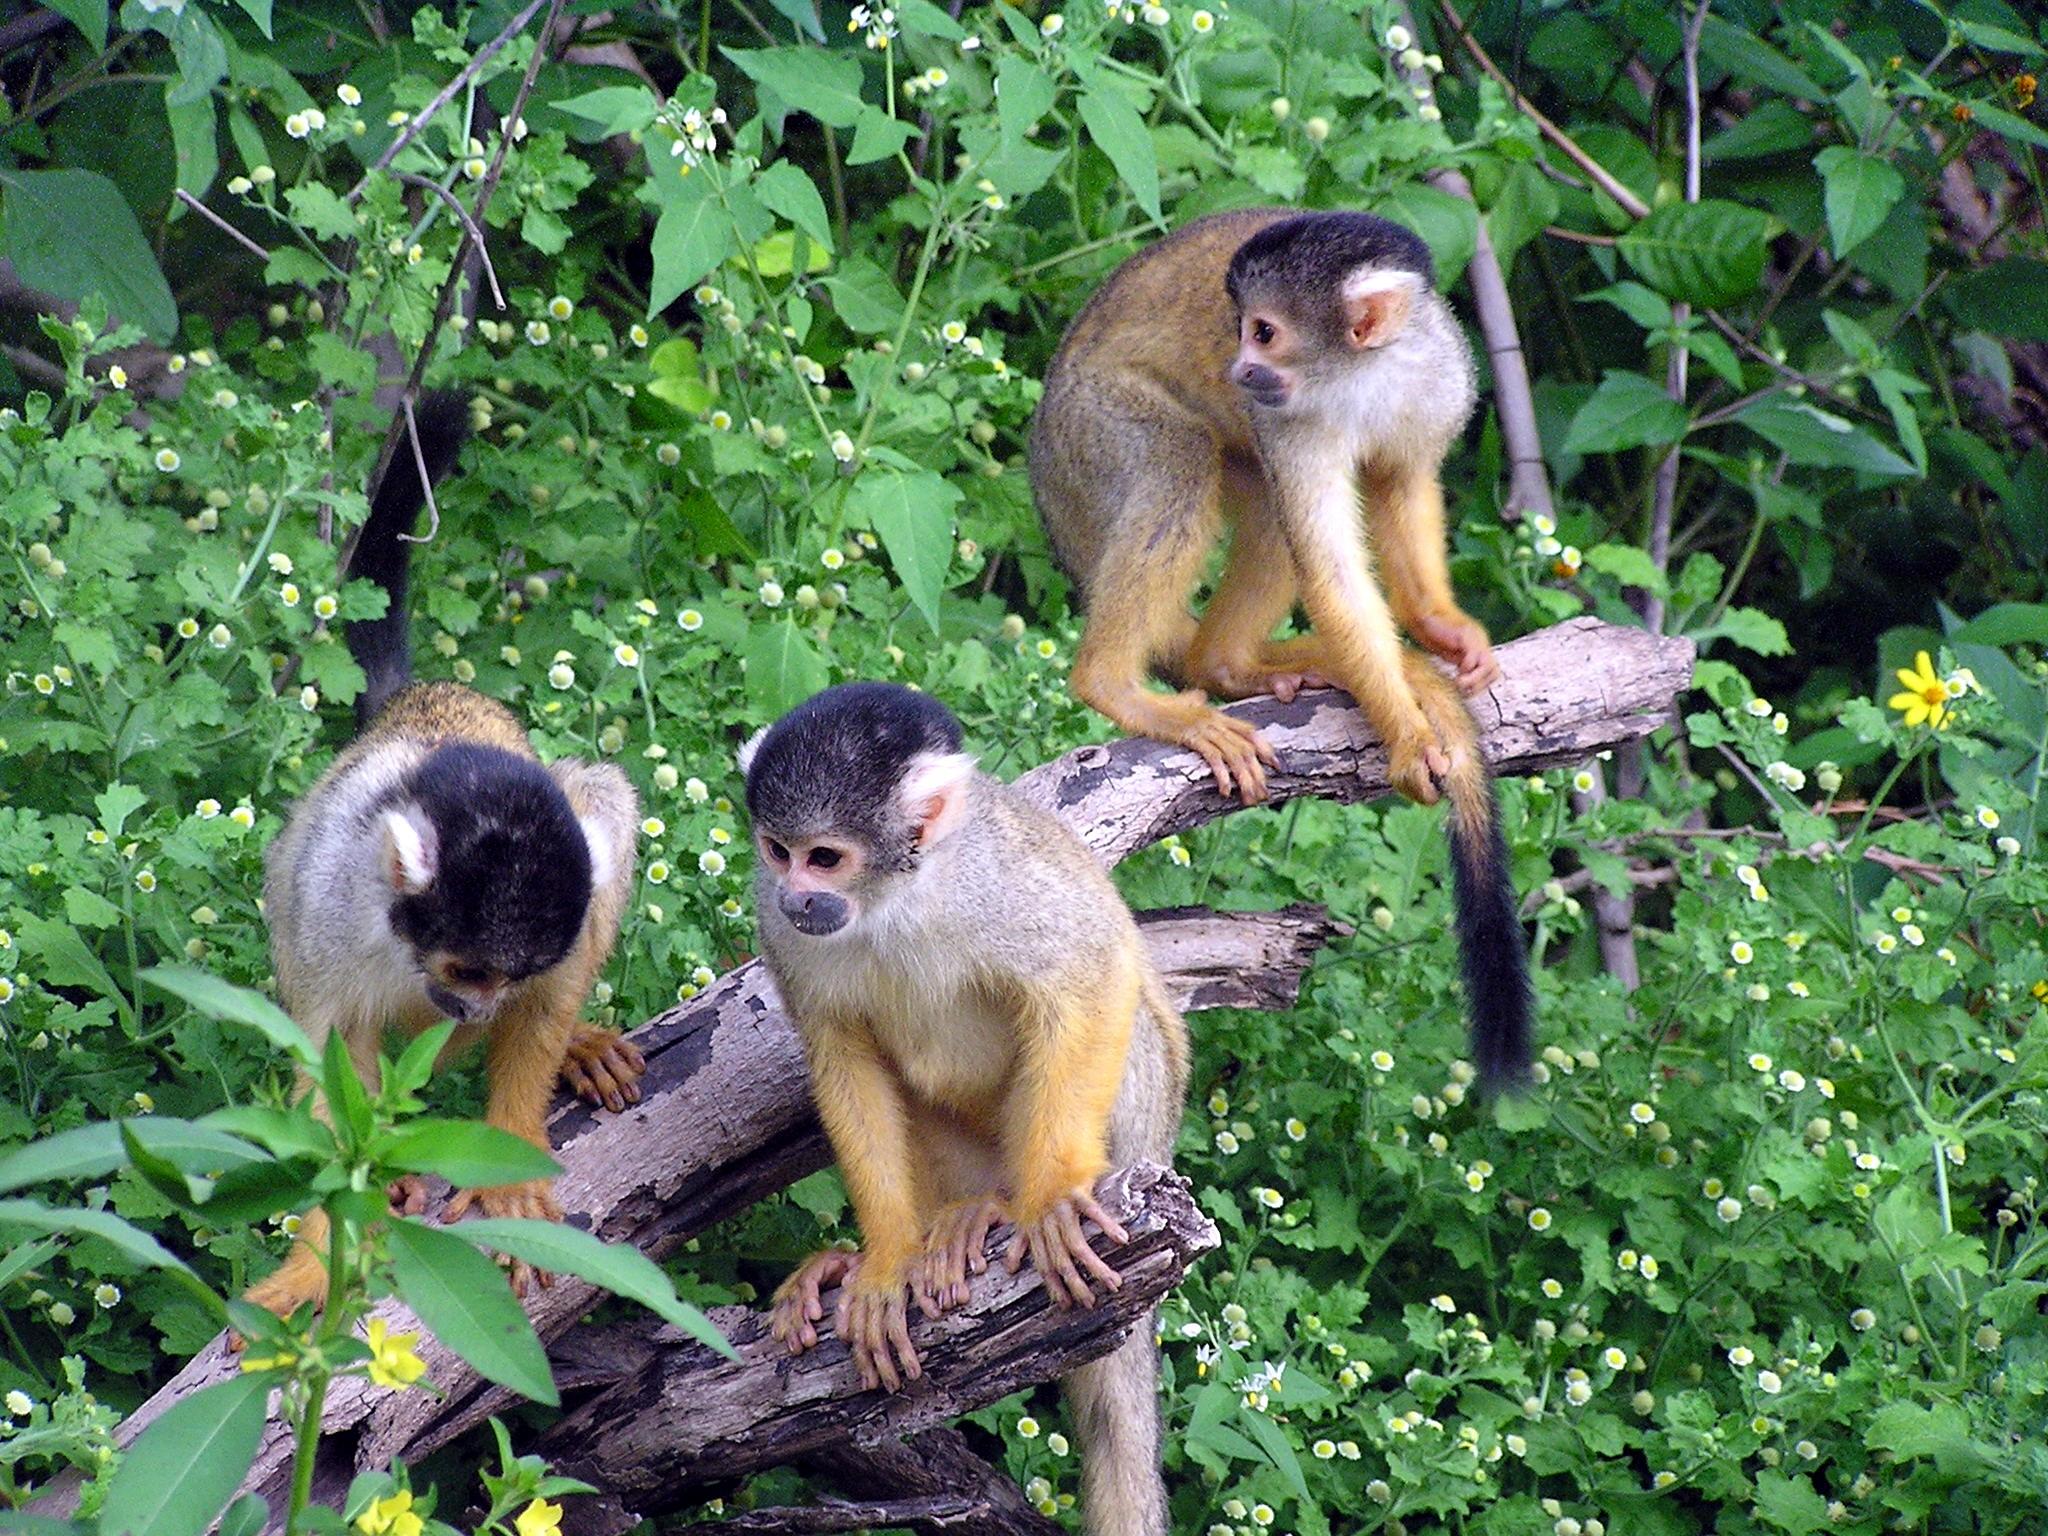 Squirrel monkeys in trees - photo#10